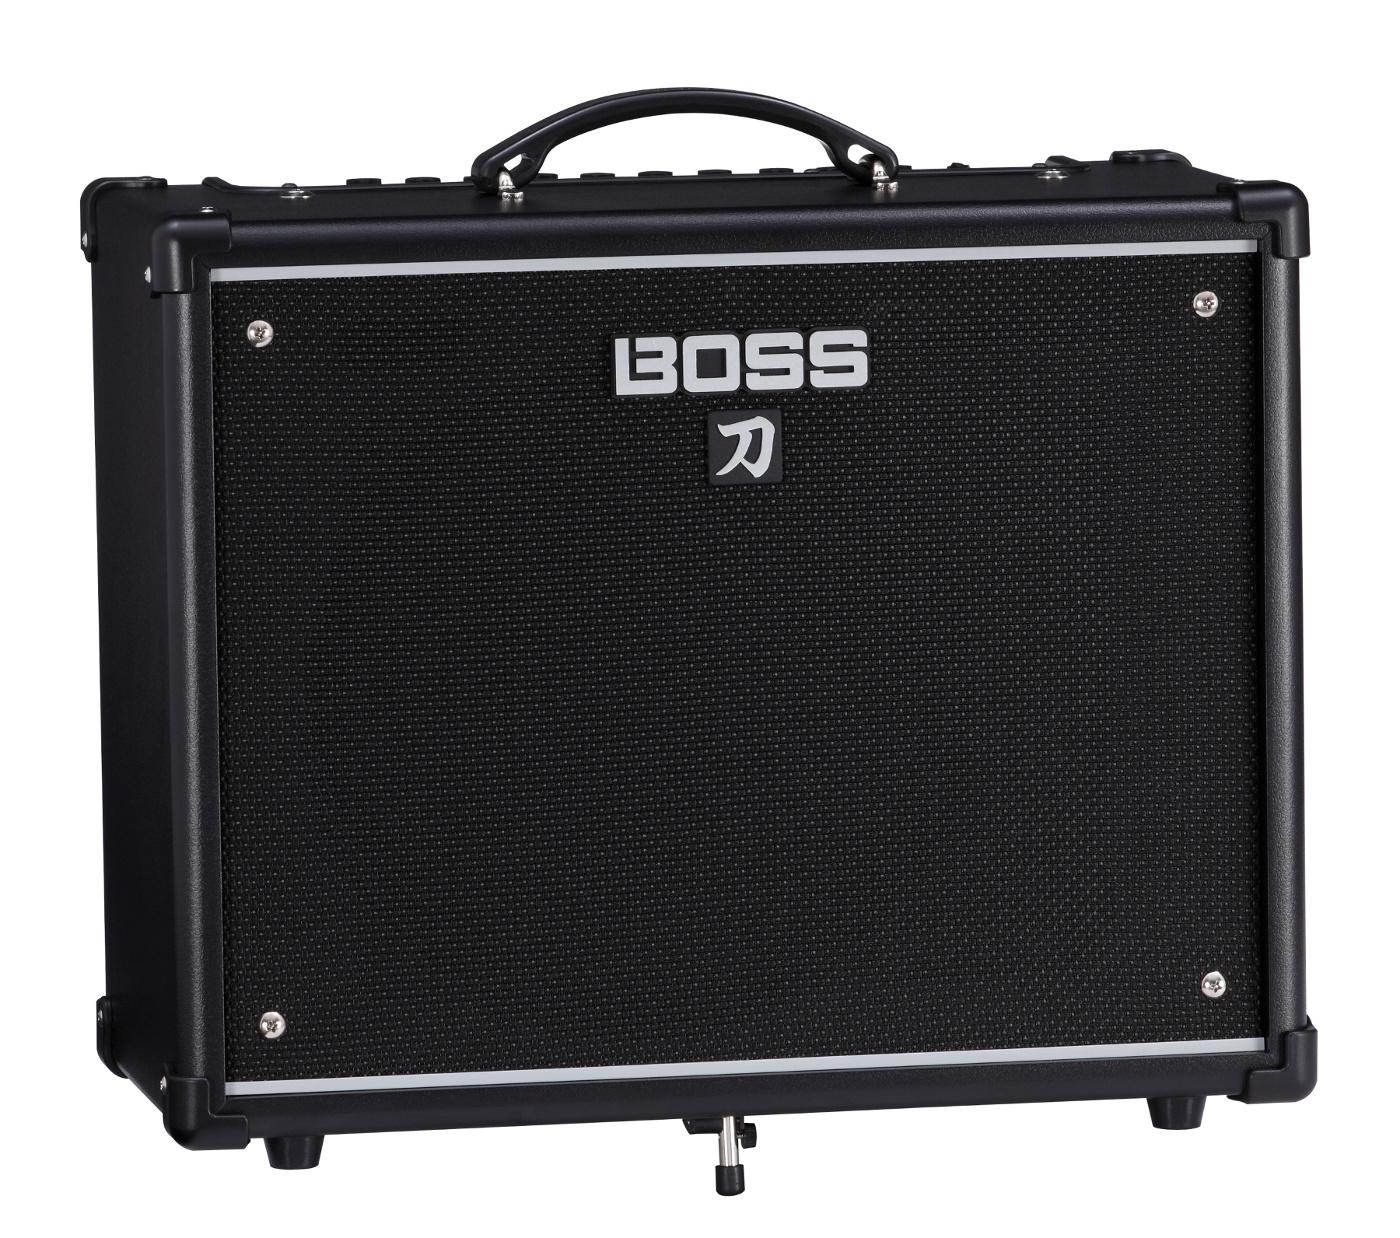 boss ktn 50 katana 50 1x12 combo guitar amplifier 50w full compass systems. Black Bedroom Furniture Sets. Home Design Ideas